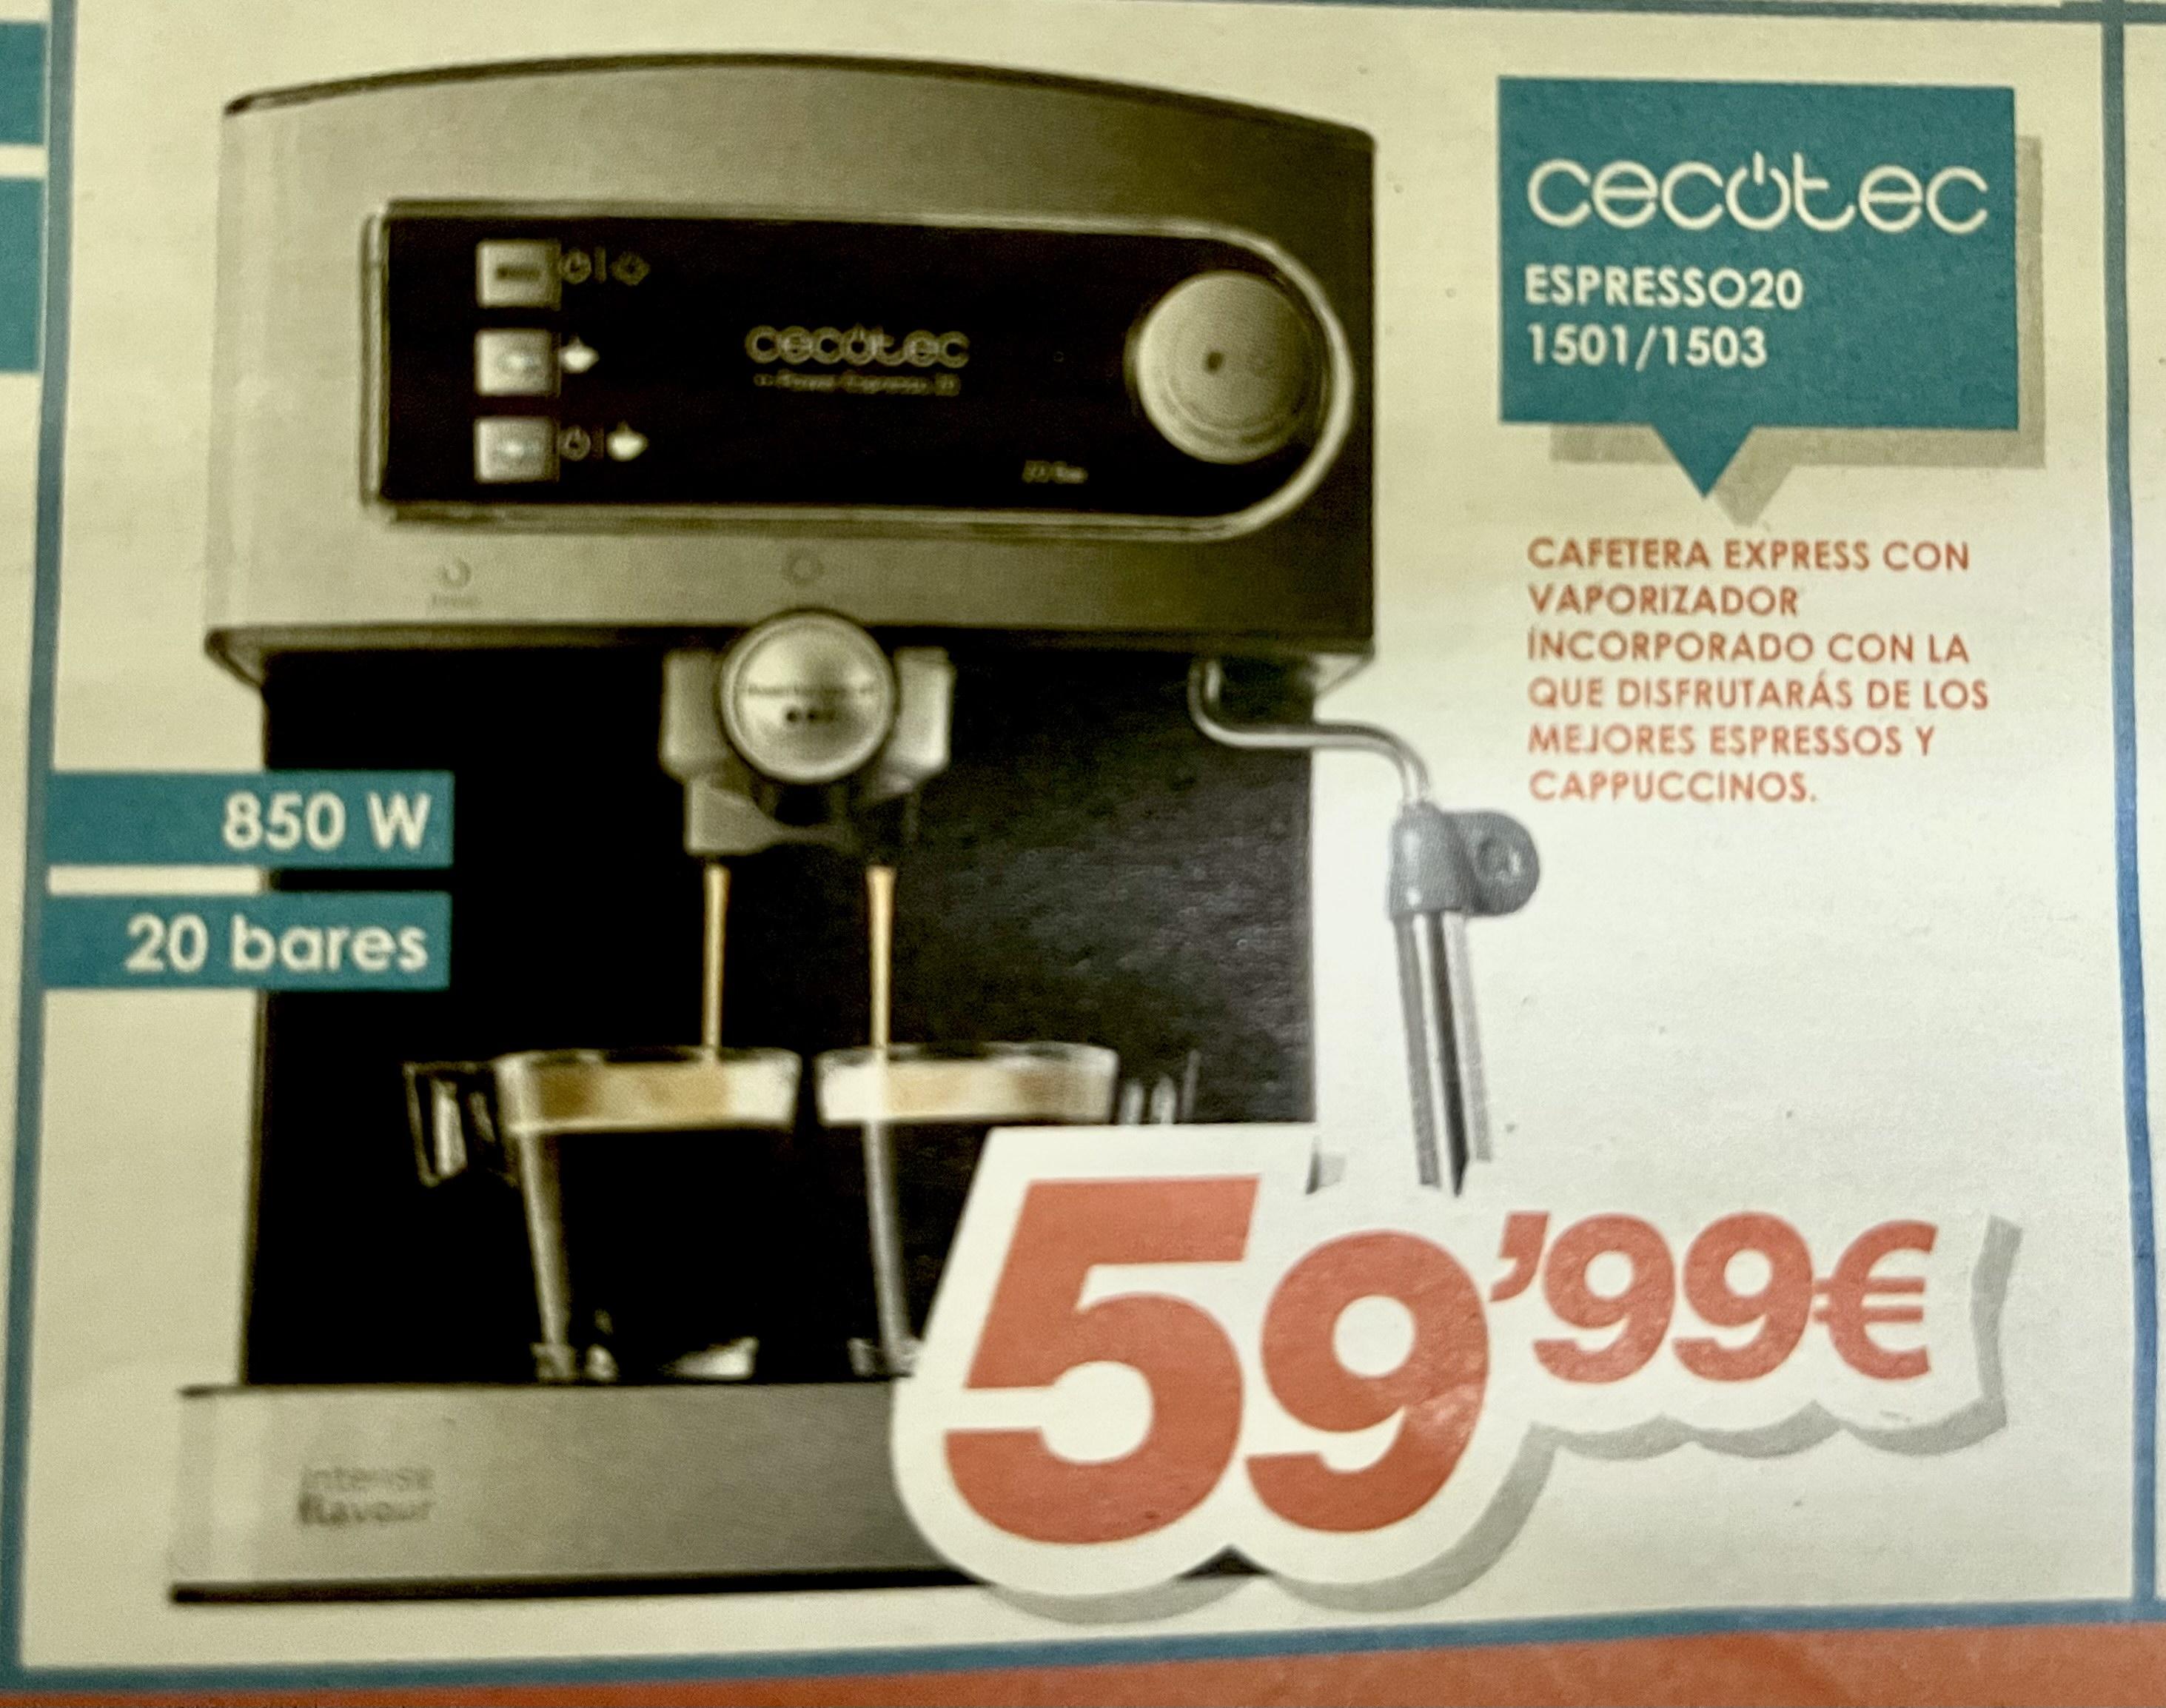 Cafetera cecotec express